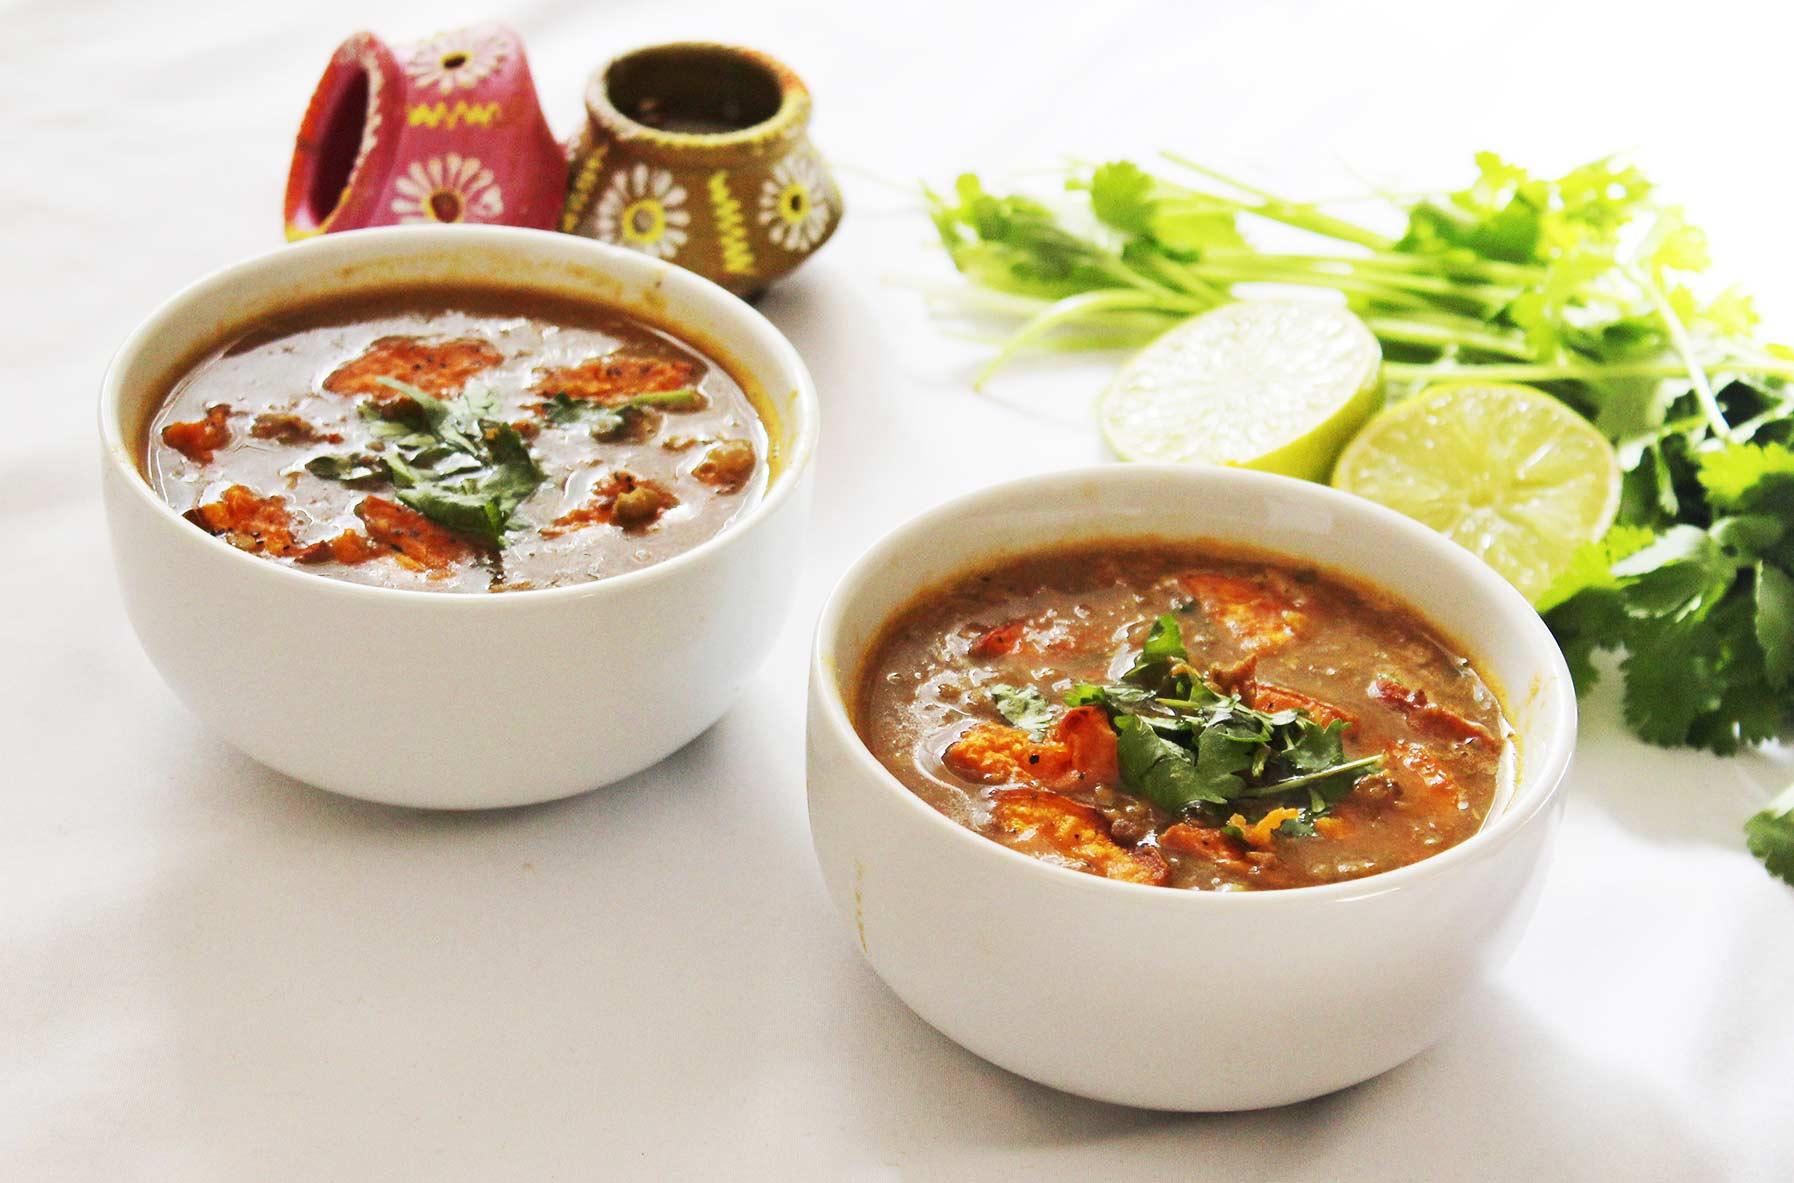 Frijol mungo con sopa de verduras